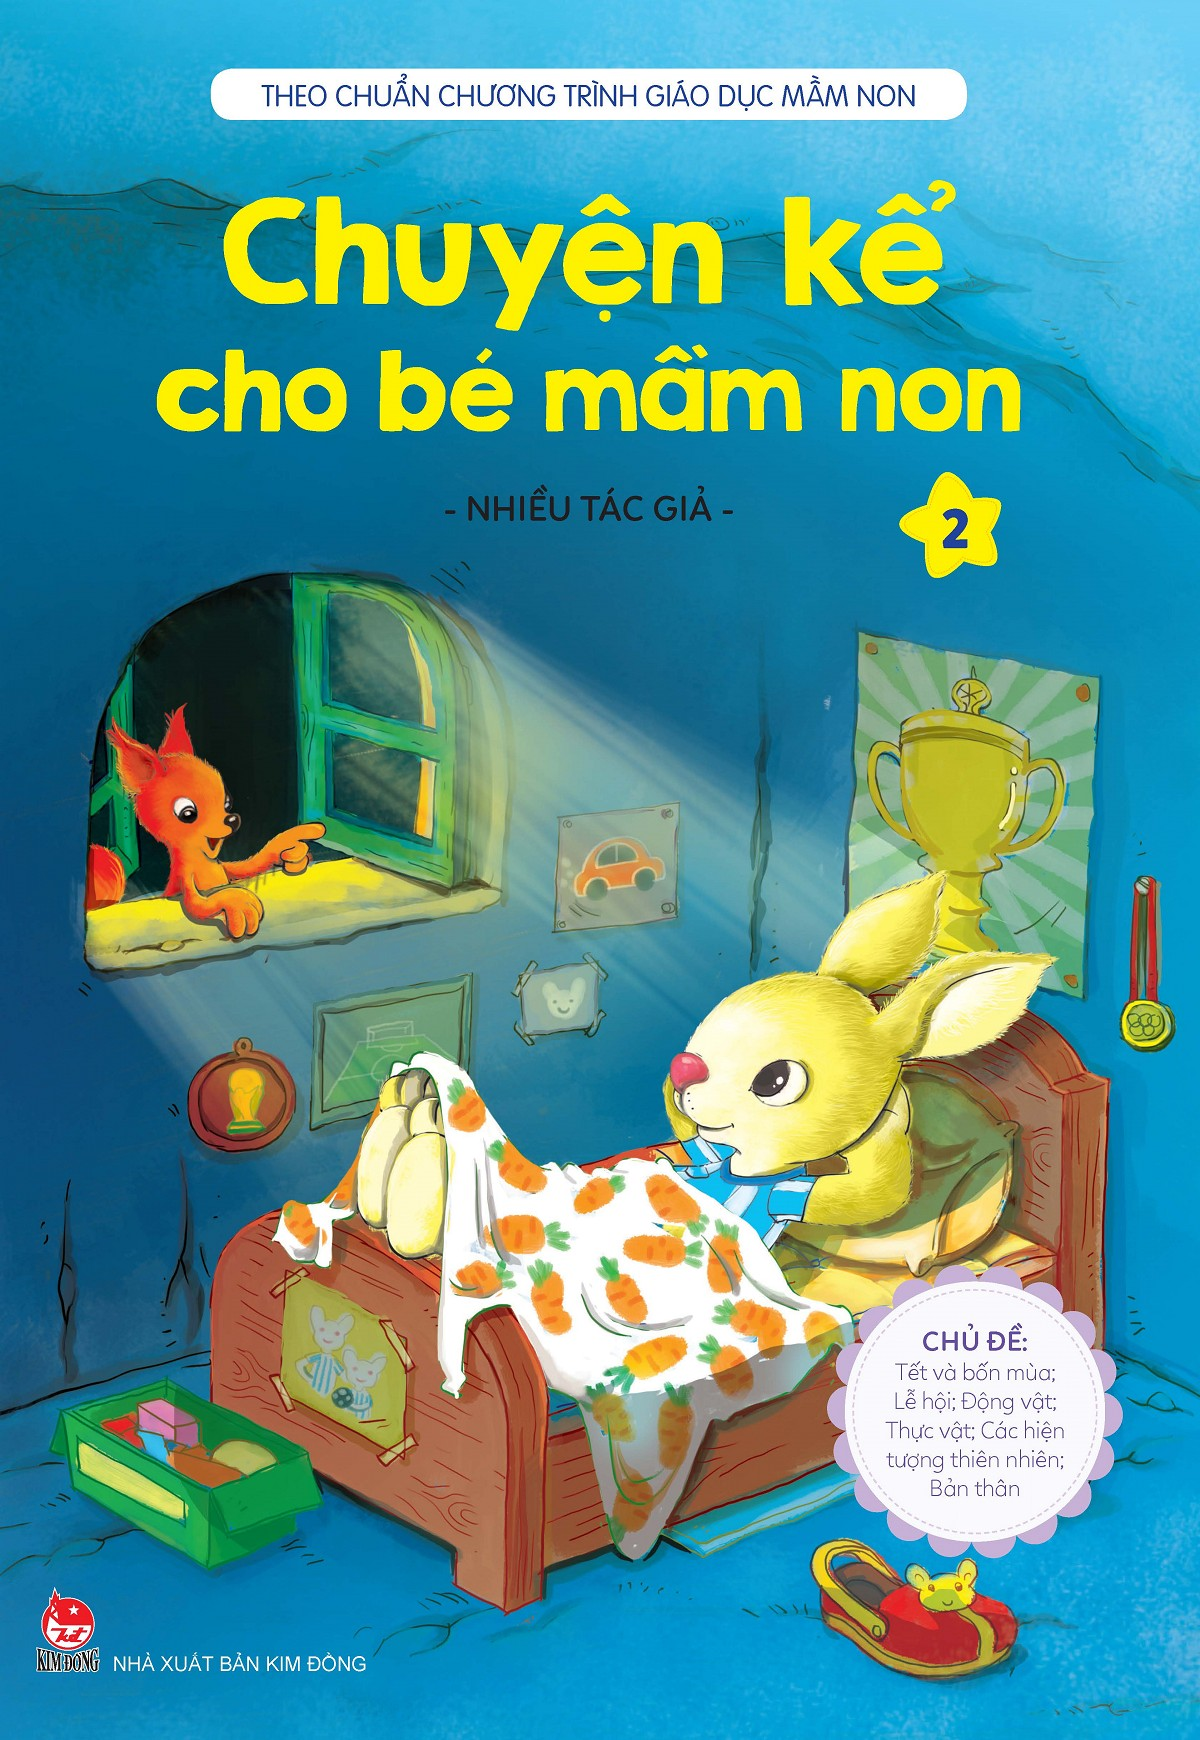 chuyen-ke-cho-be-mam-non_bia-final_page_2.u547.d20161206.t114729.891941.jpg